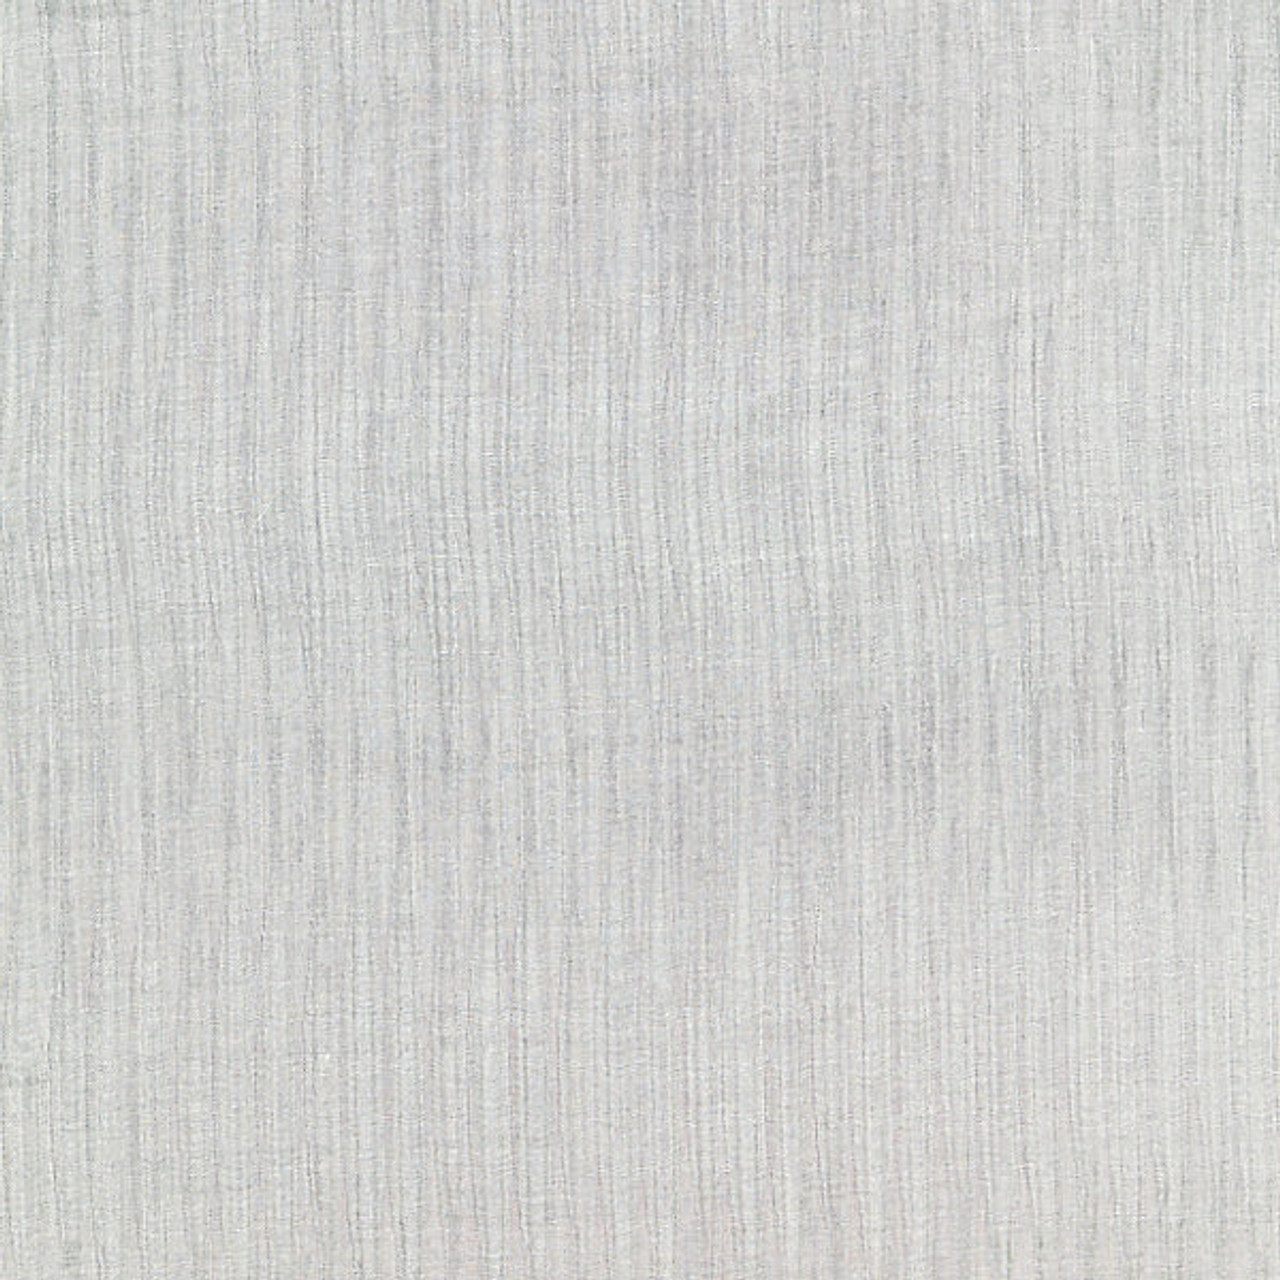 Aurora Sheer/Silver 27055-001 by Scalamandre Fabric